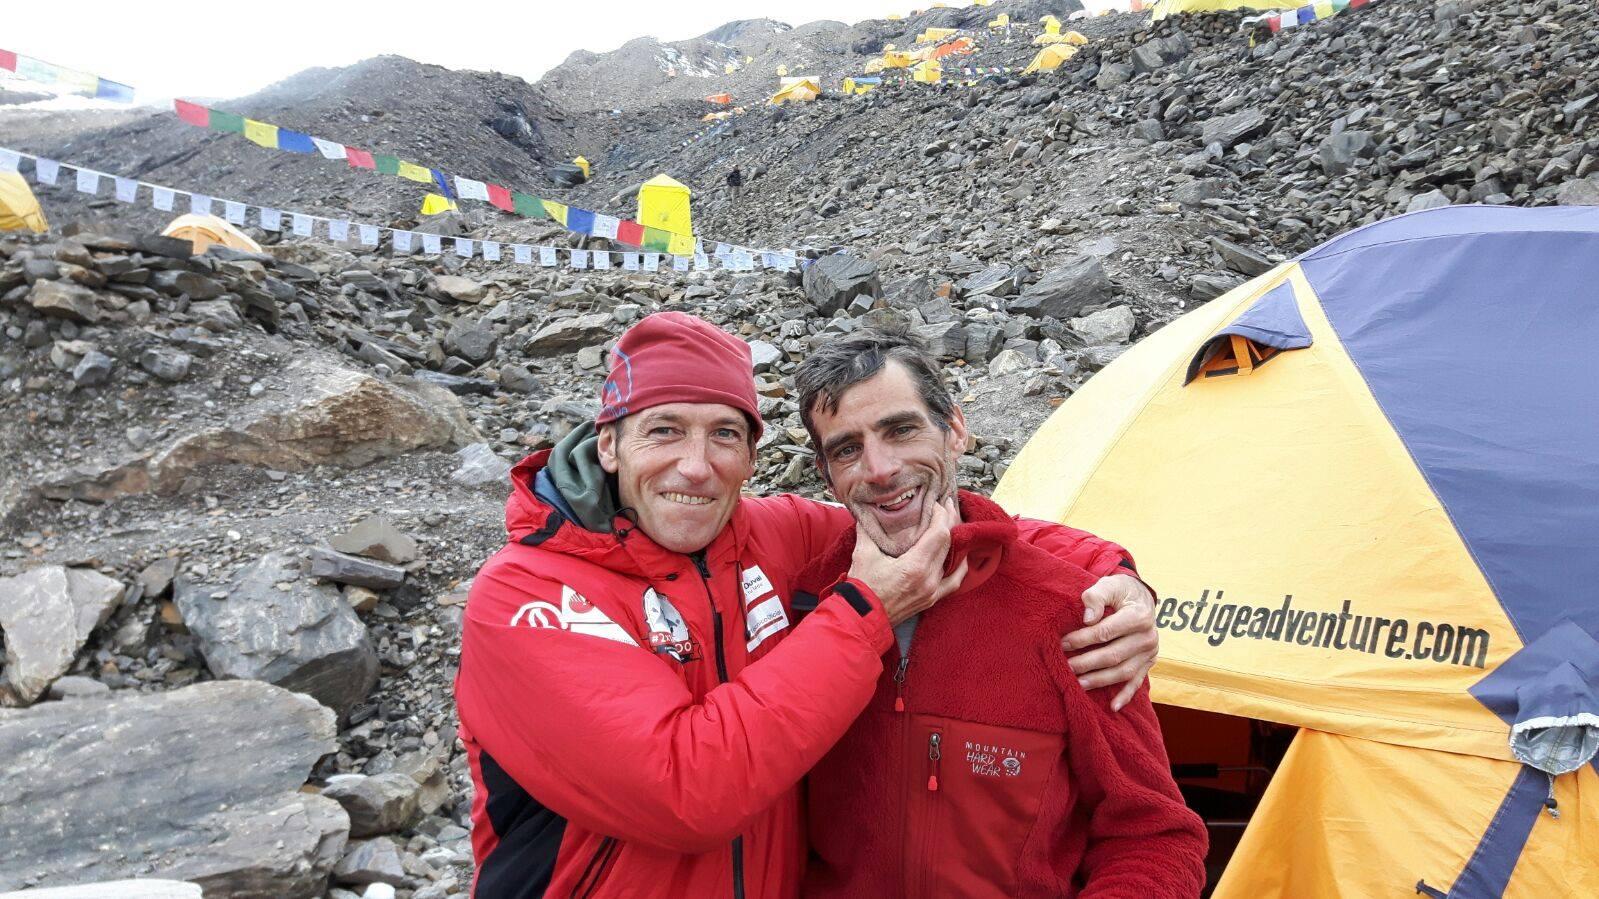 Alberto Zerain és Mariano Galvan tavaly a Manaszlun Forrás: 2x14x8000 Facebook